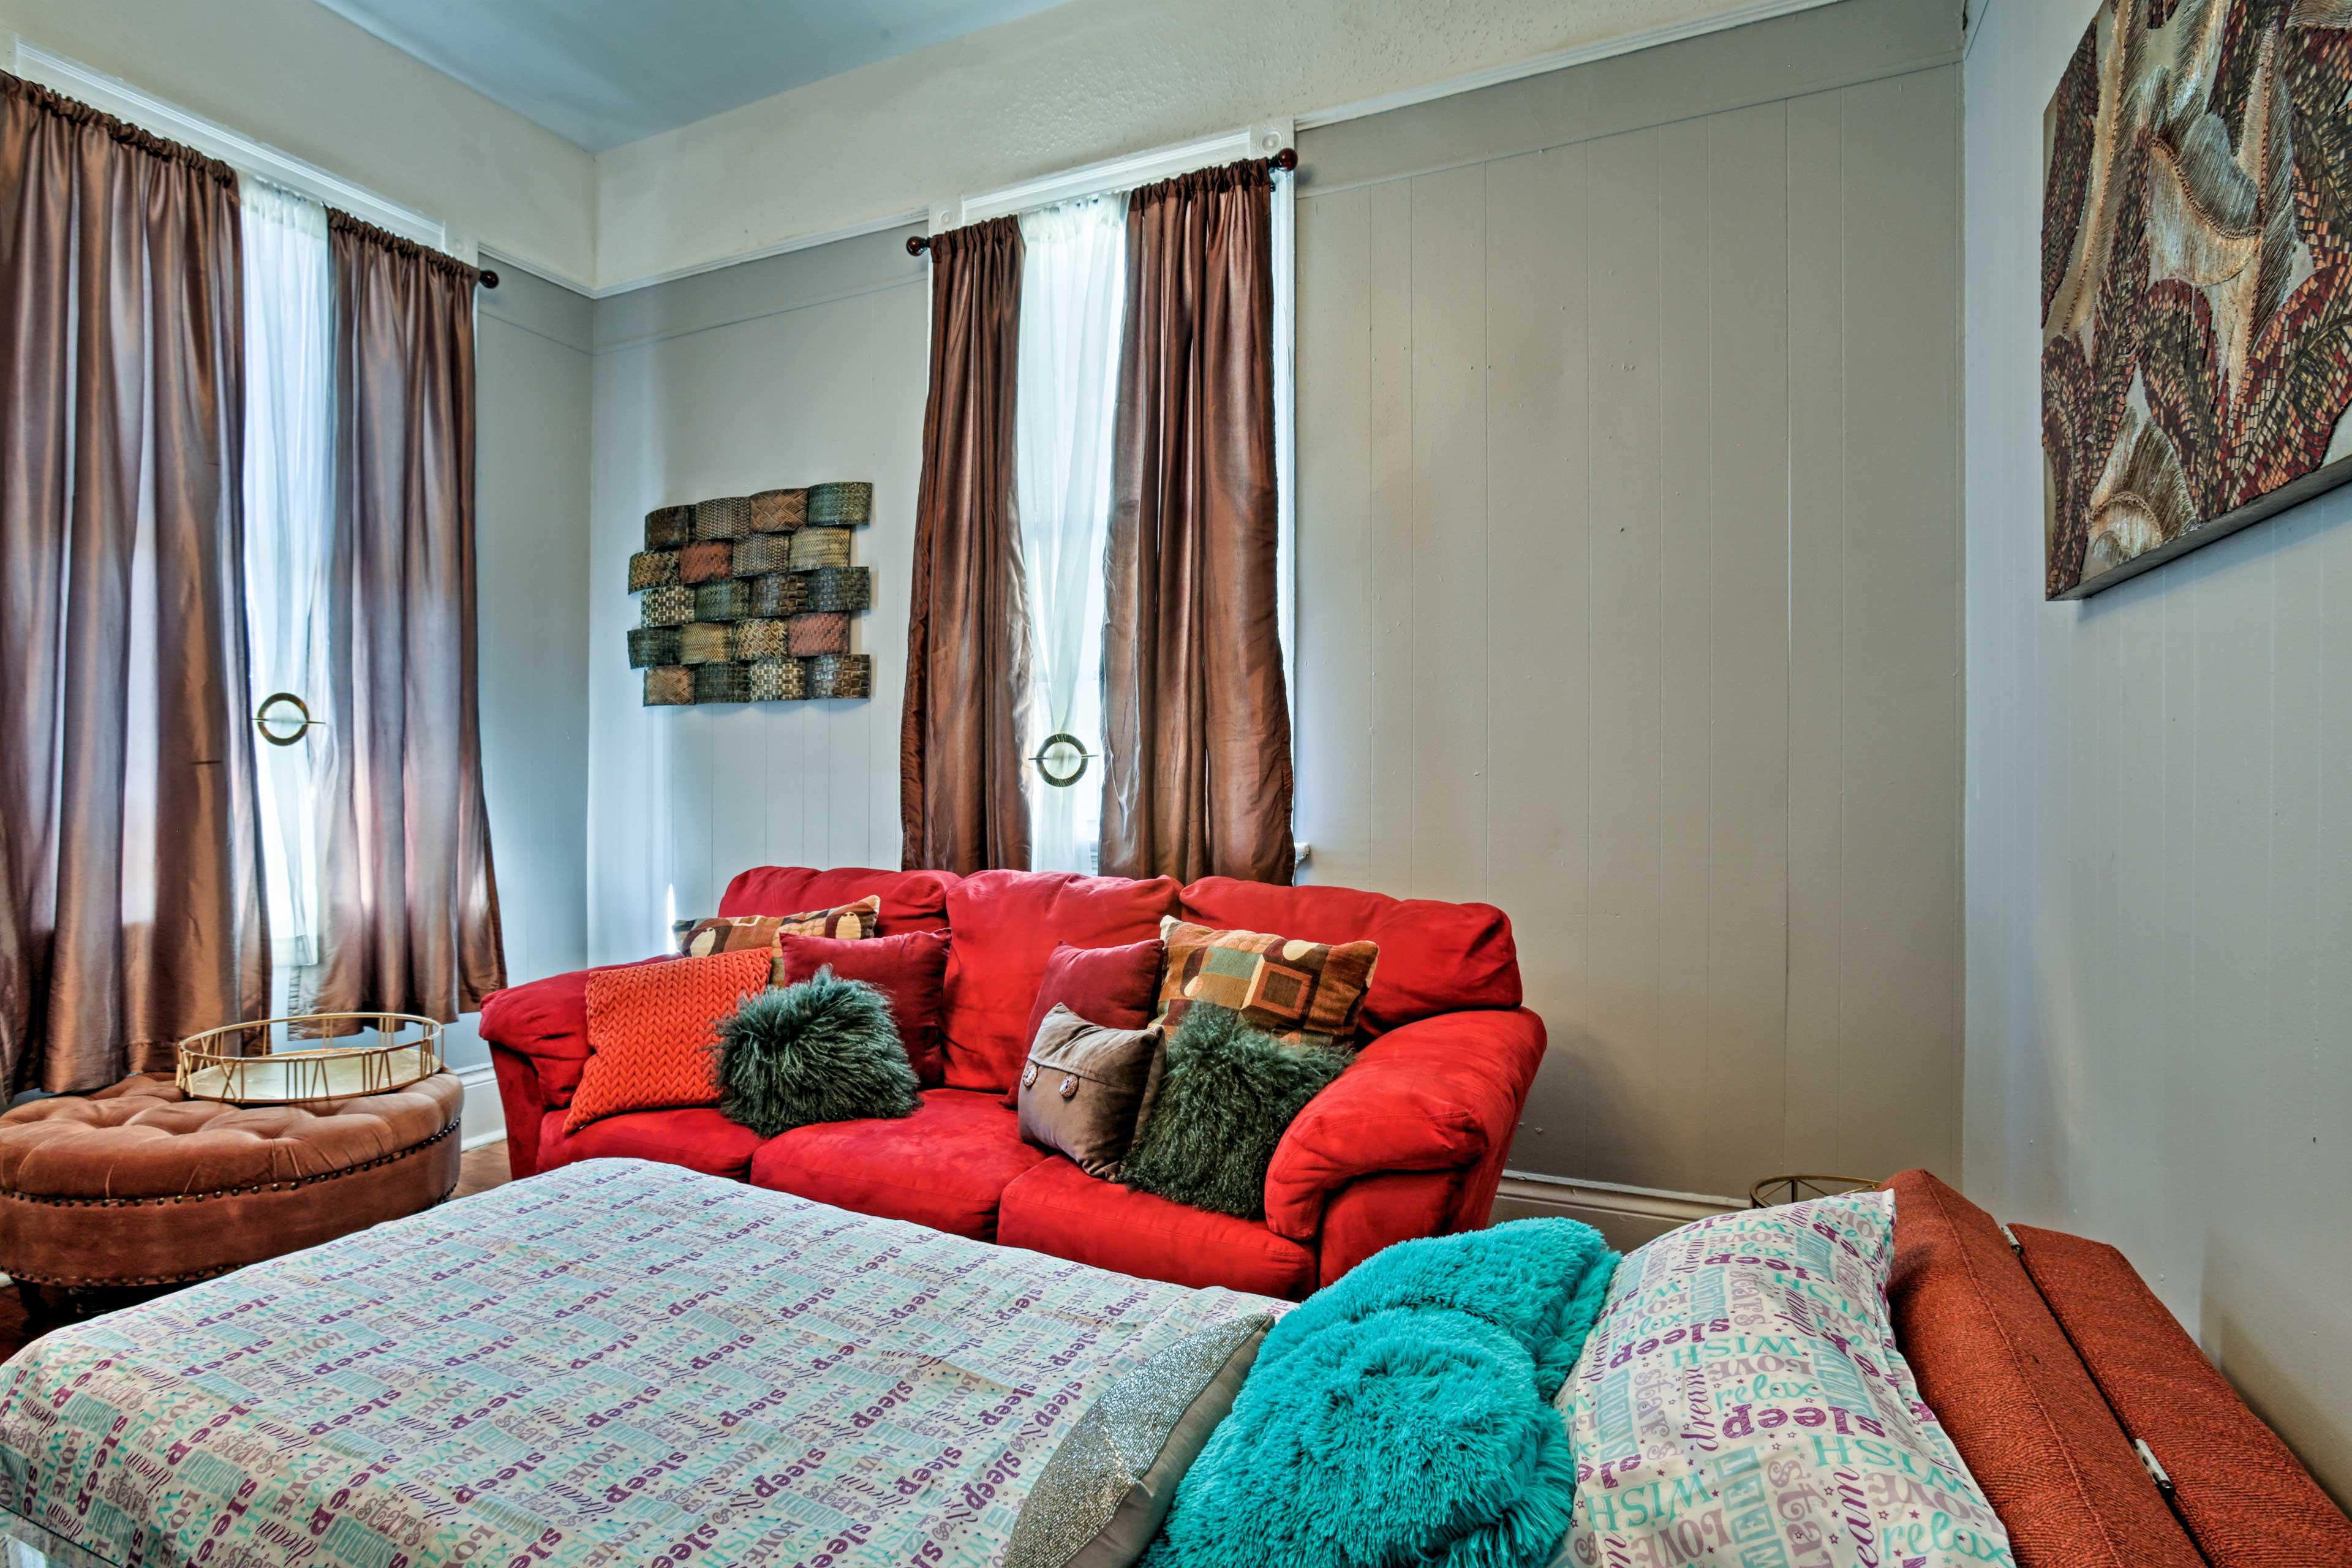 The home boasts impressive 12-foot ceilings.